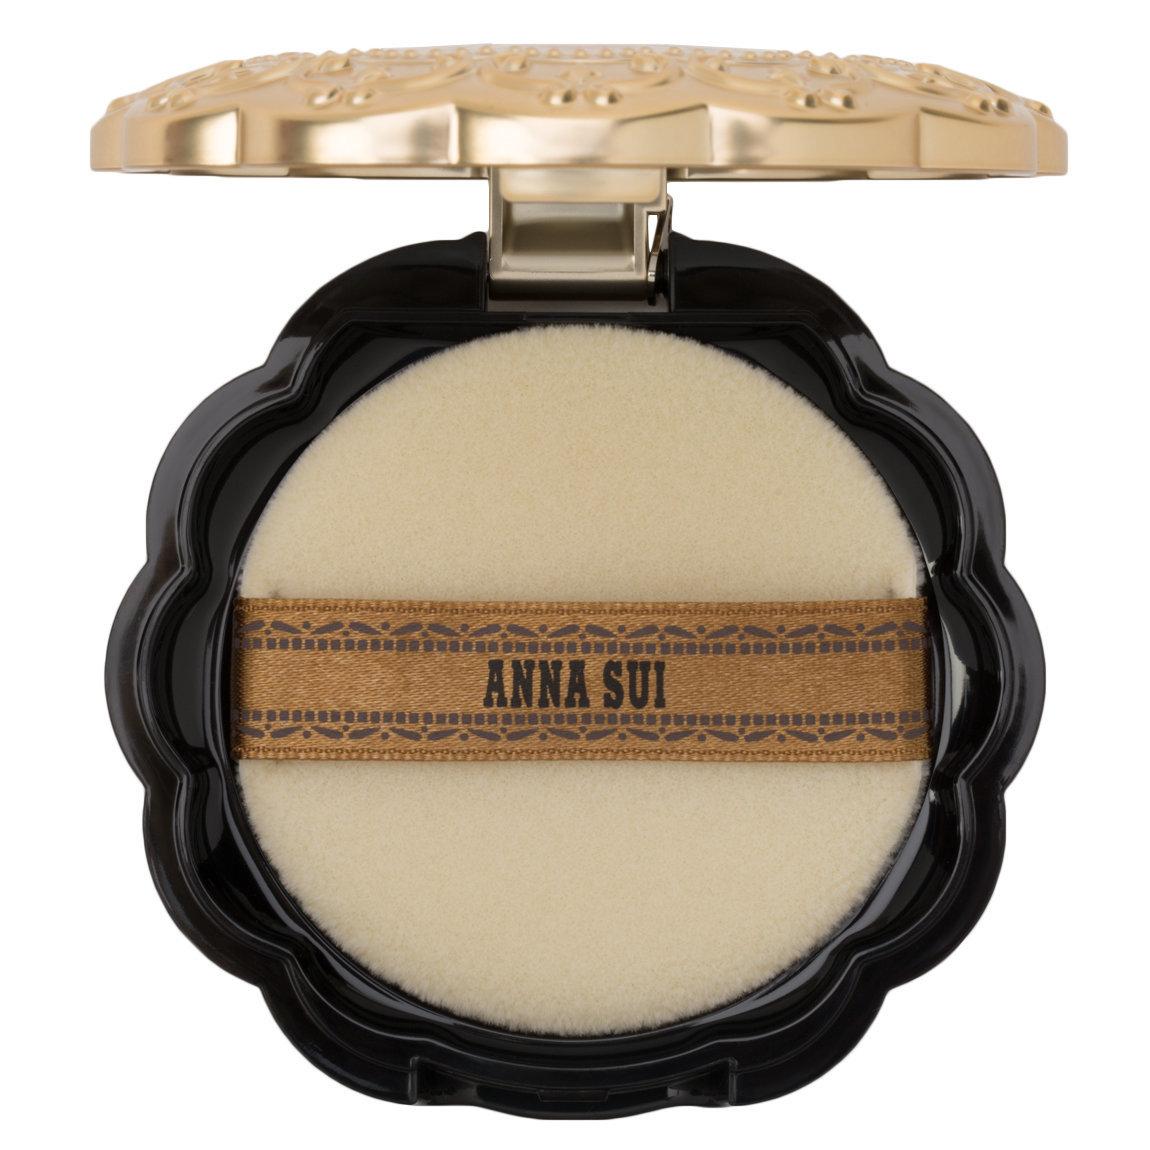 Anna Sui Makeup Compact Case 1